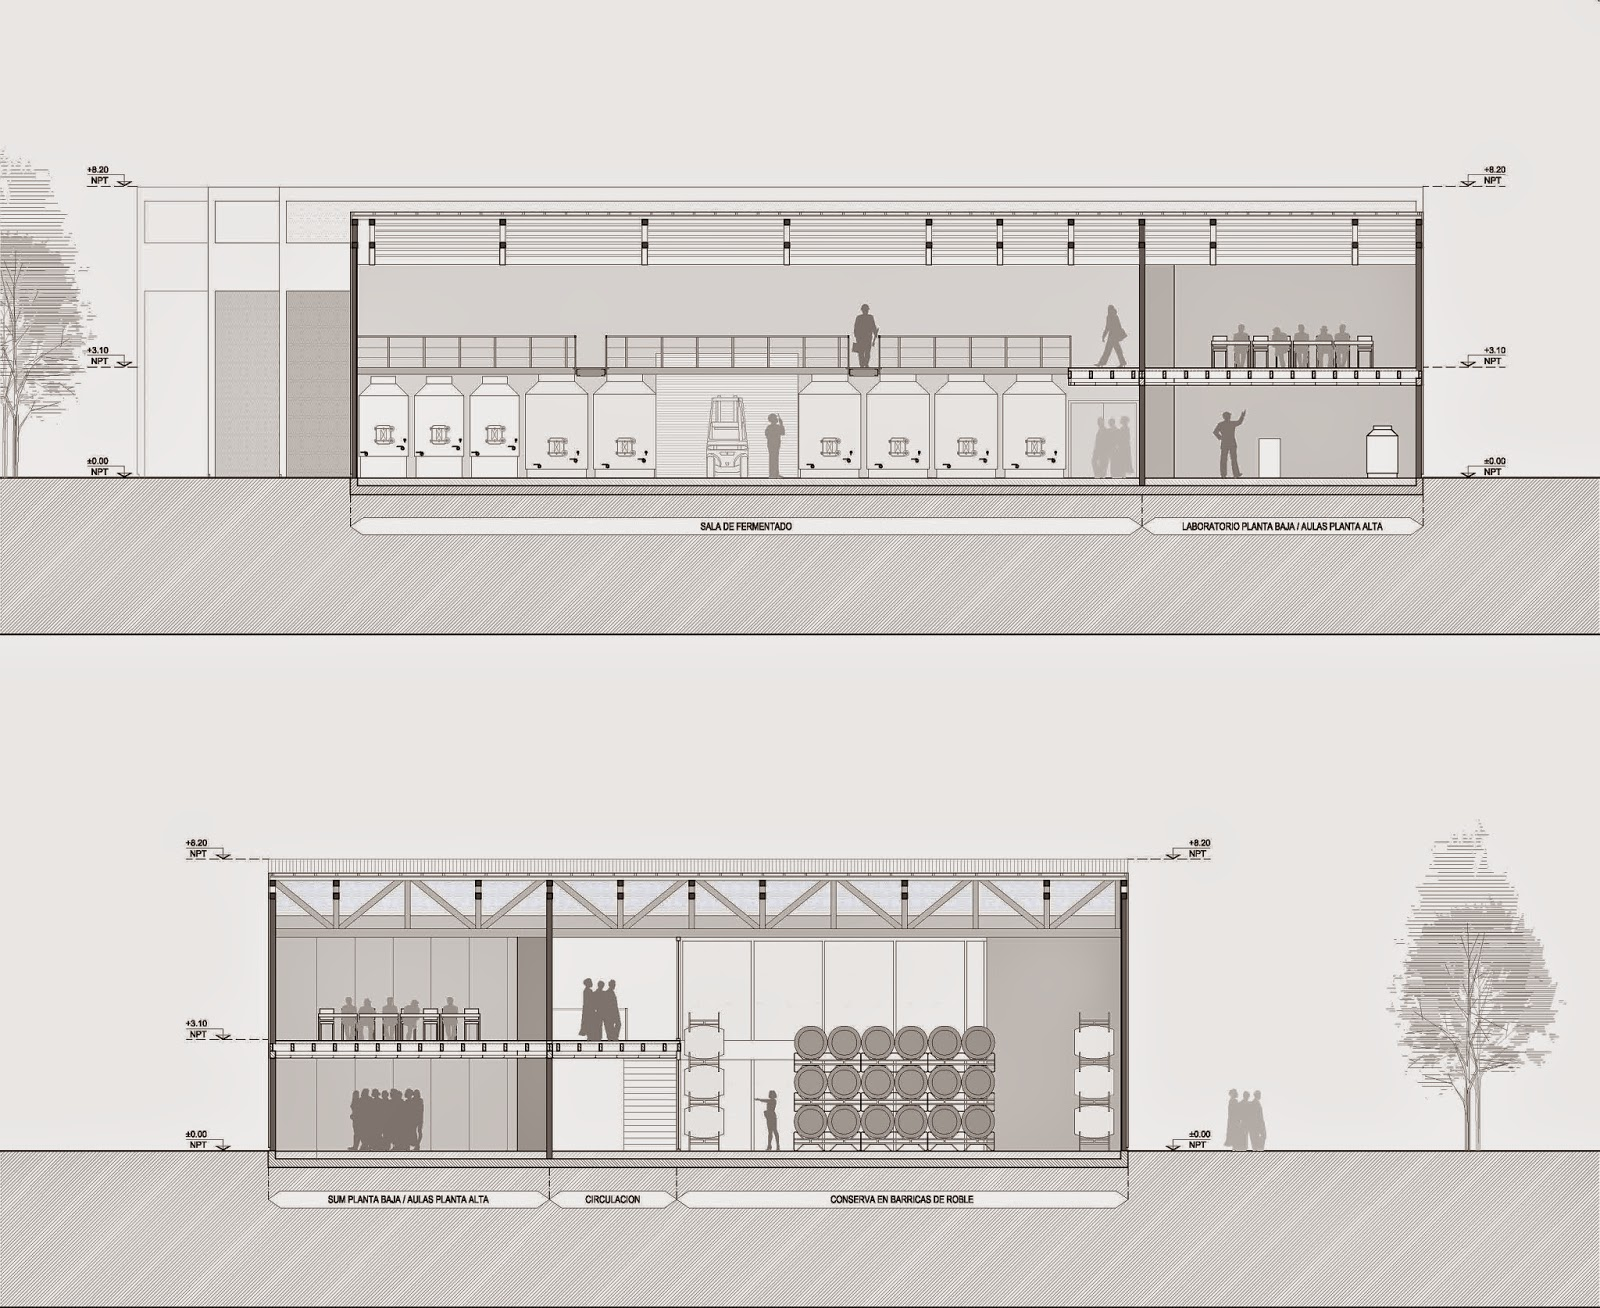 Bodega escuela hotel en mendoza arquitectura 4 2014 for Arquitectura nota de corte